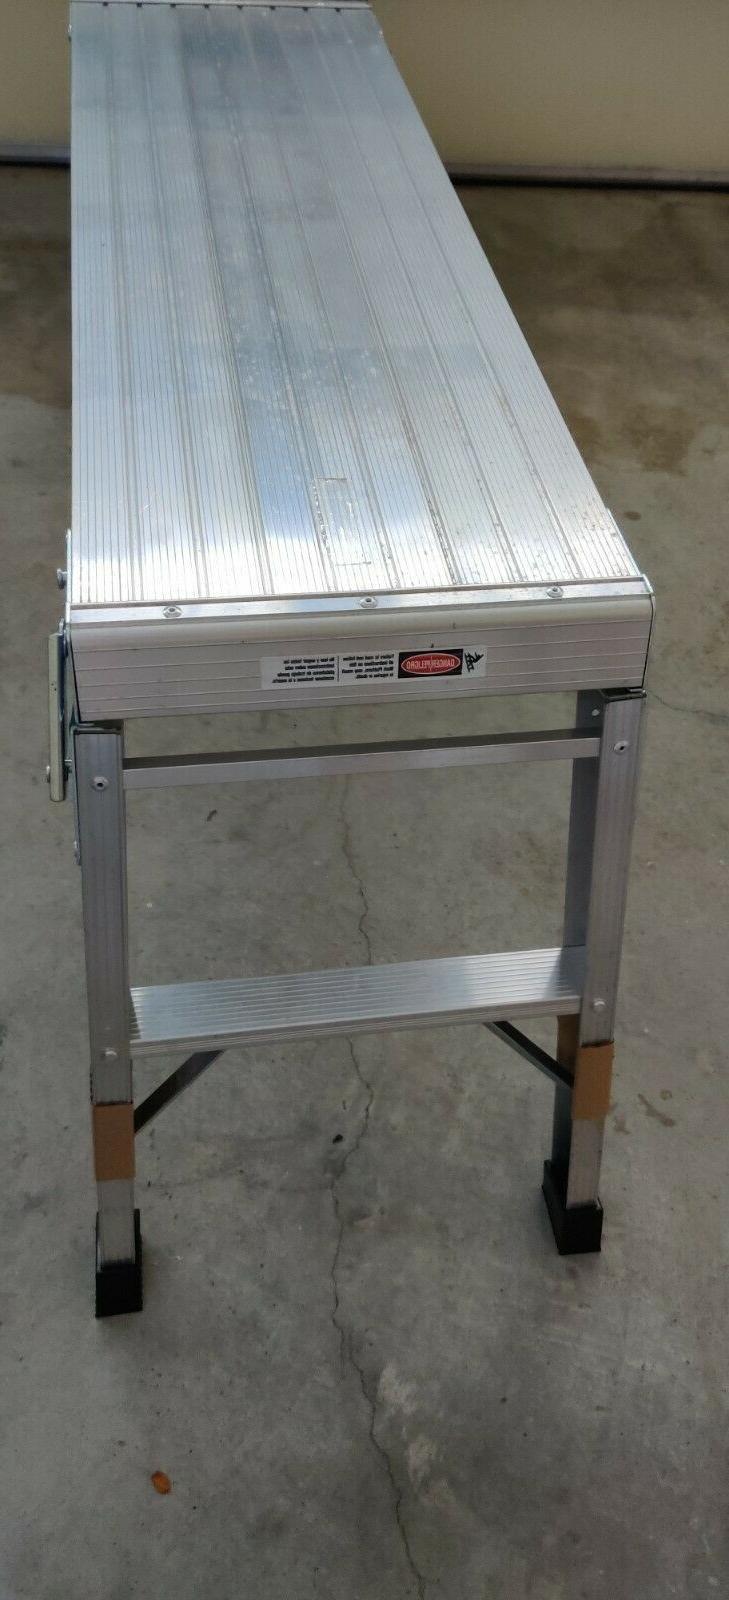 Gorilla Ladders Aluminum Work Platform Max lbs